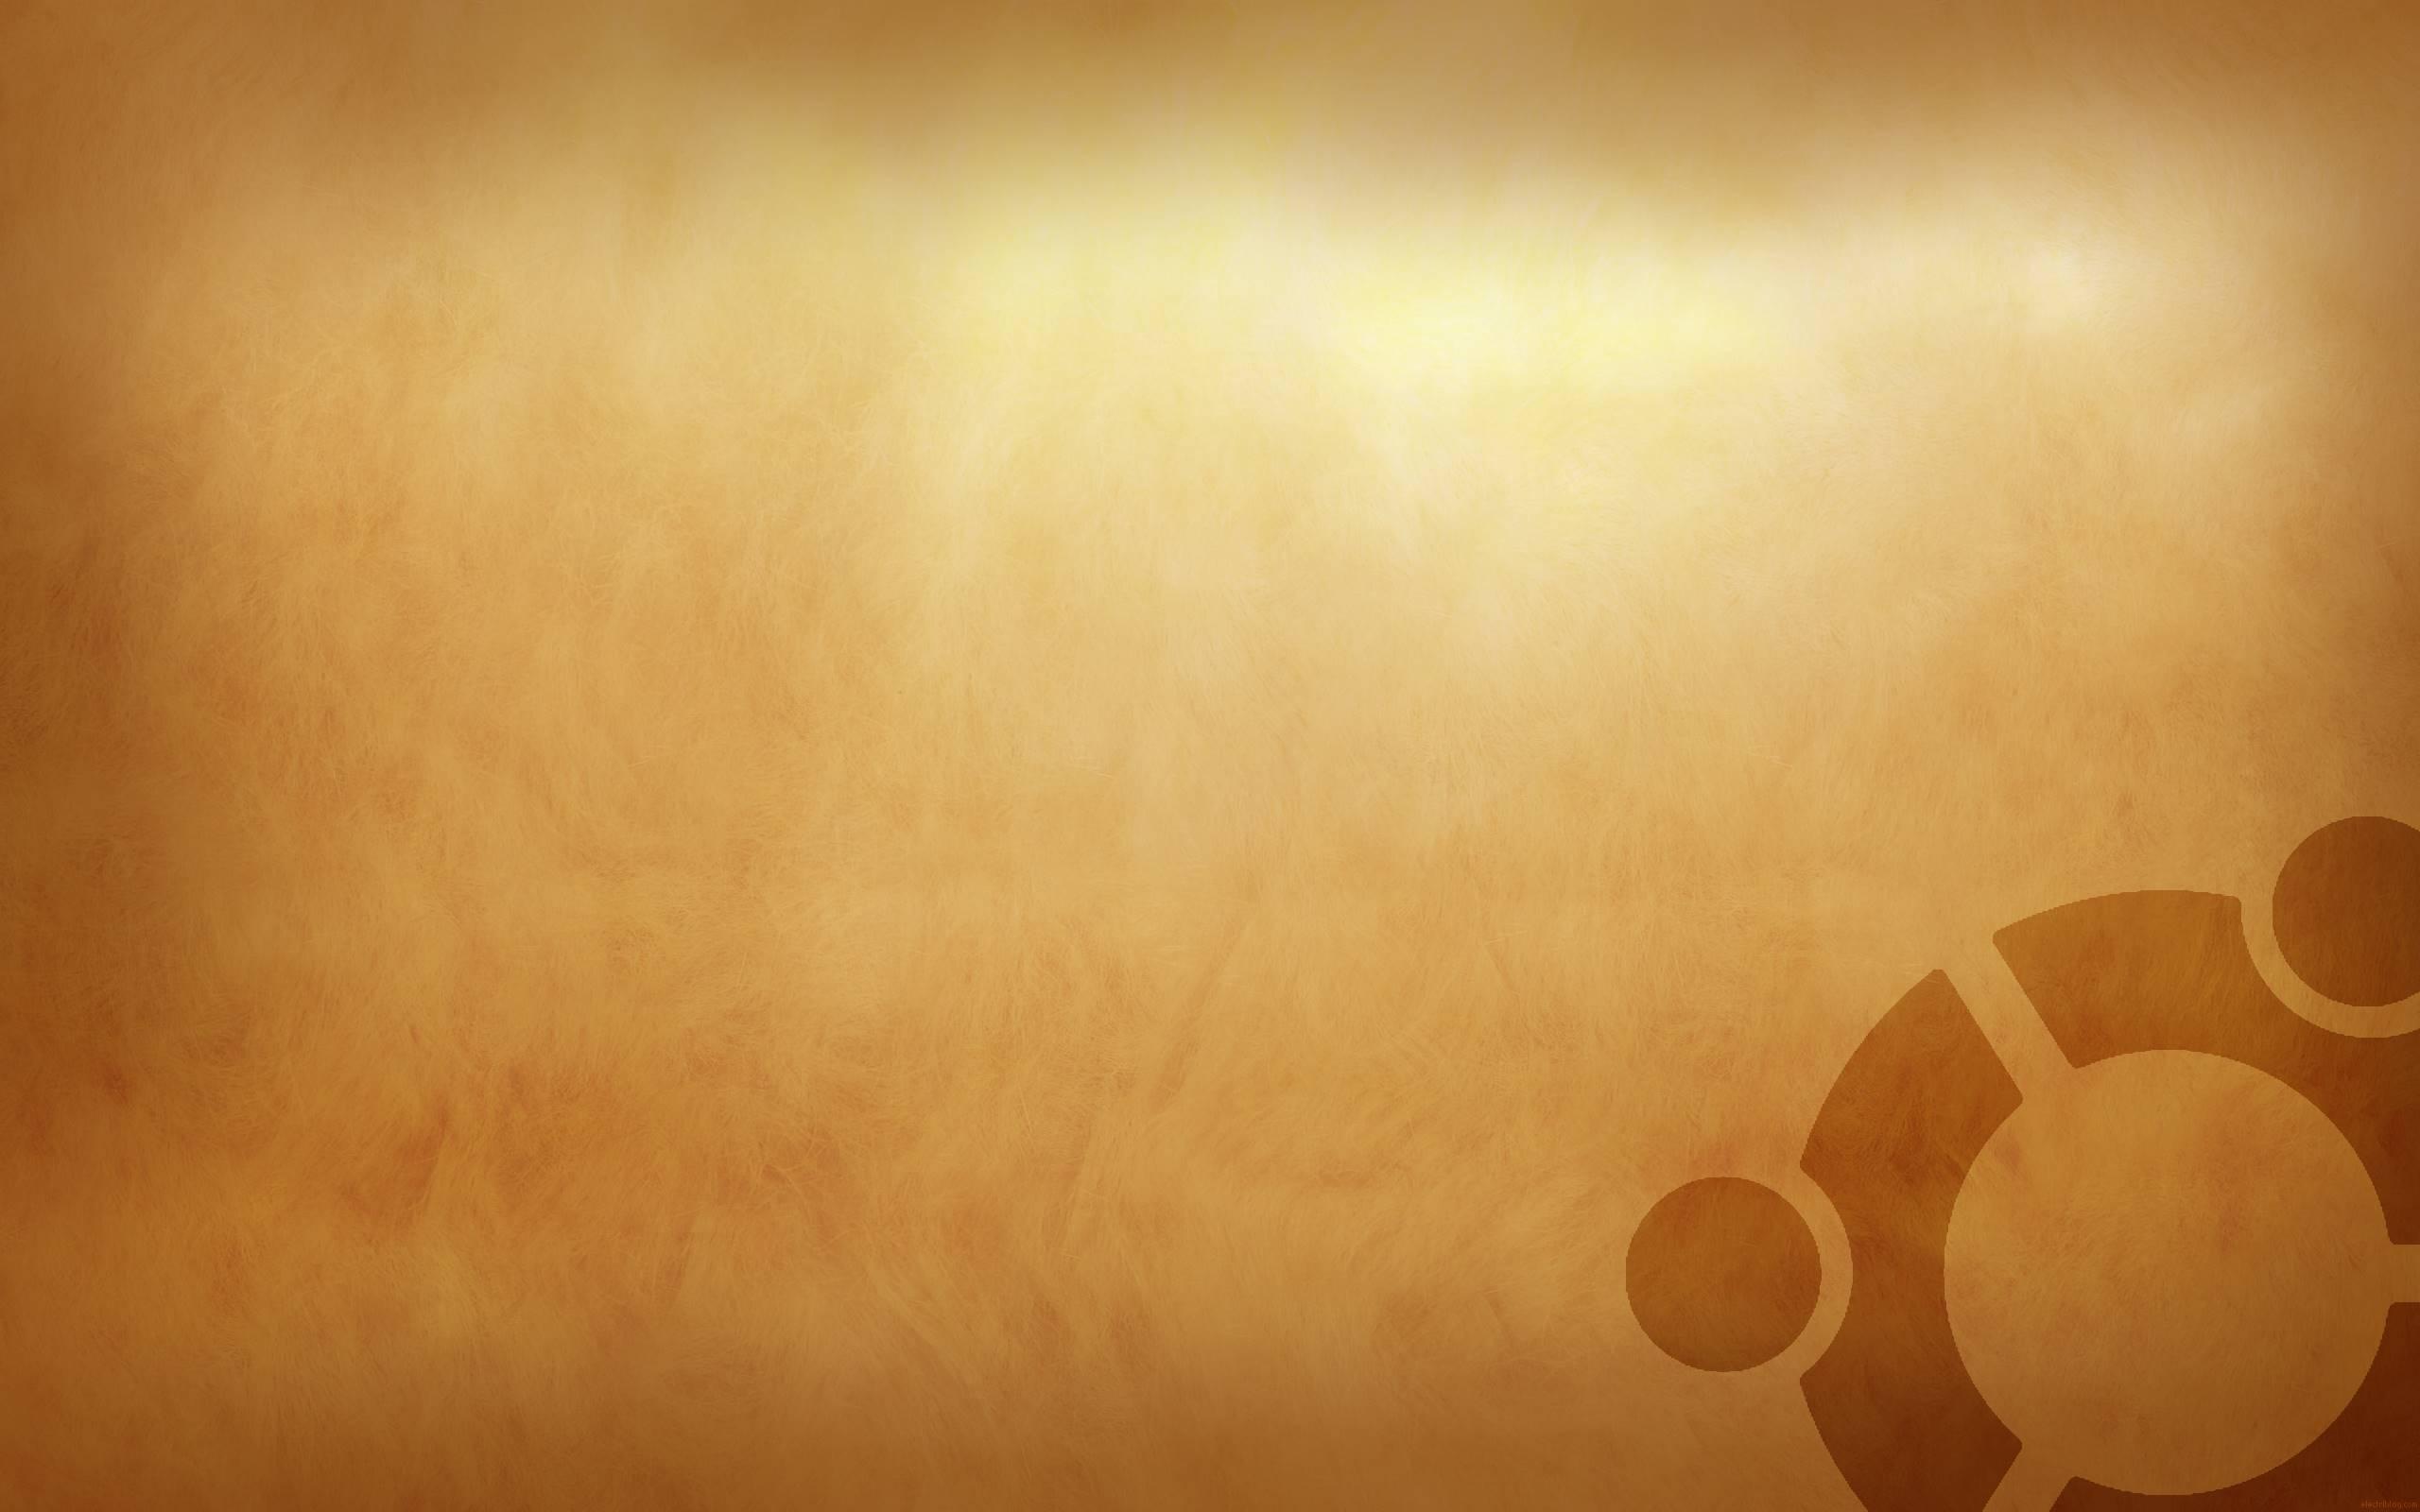 hd ubuntu wallpaper and set it as default background Hope you like 2560x1600